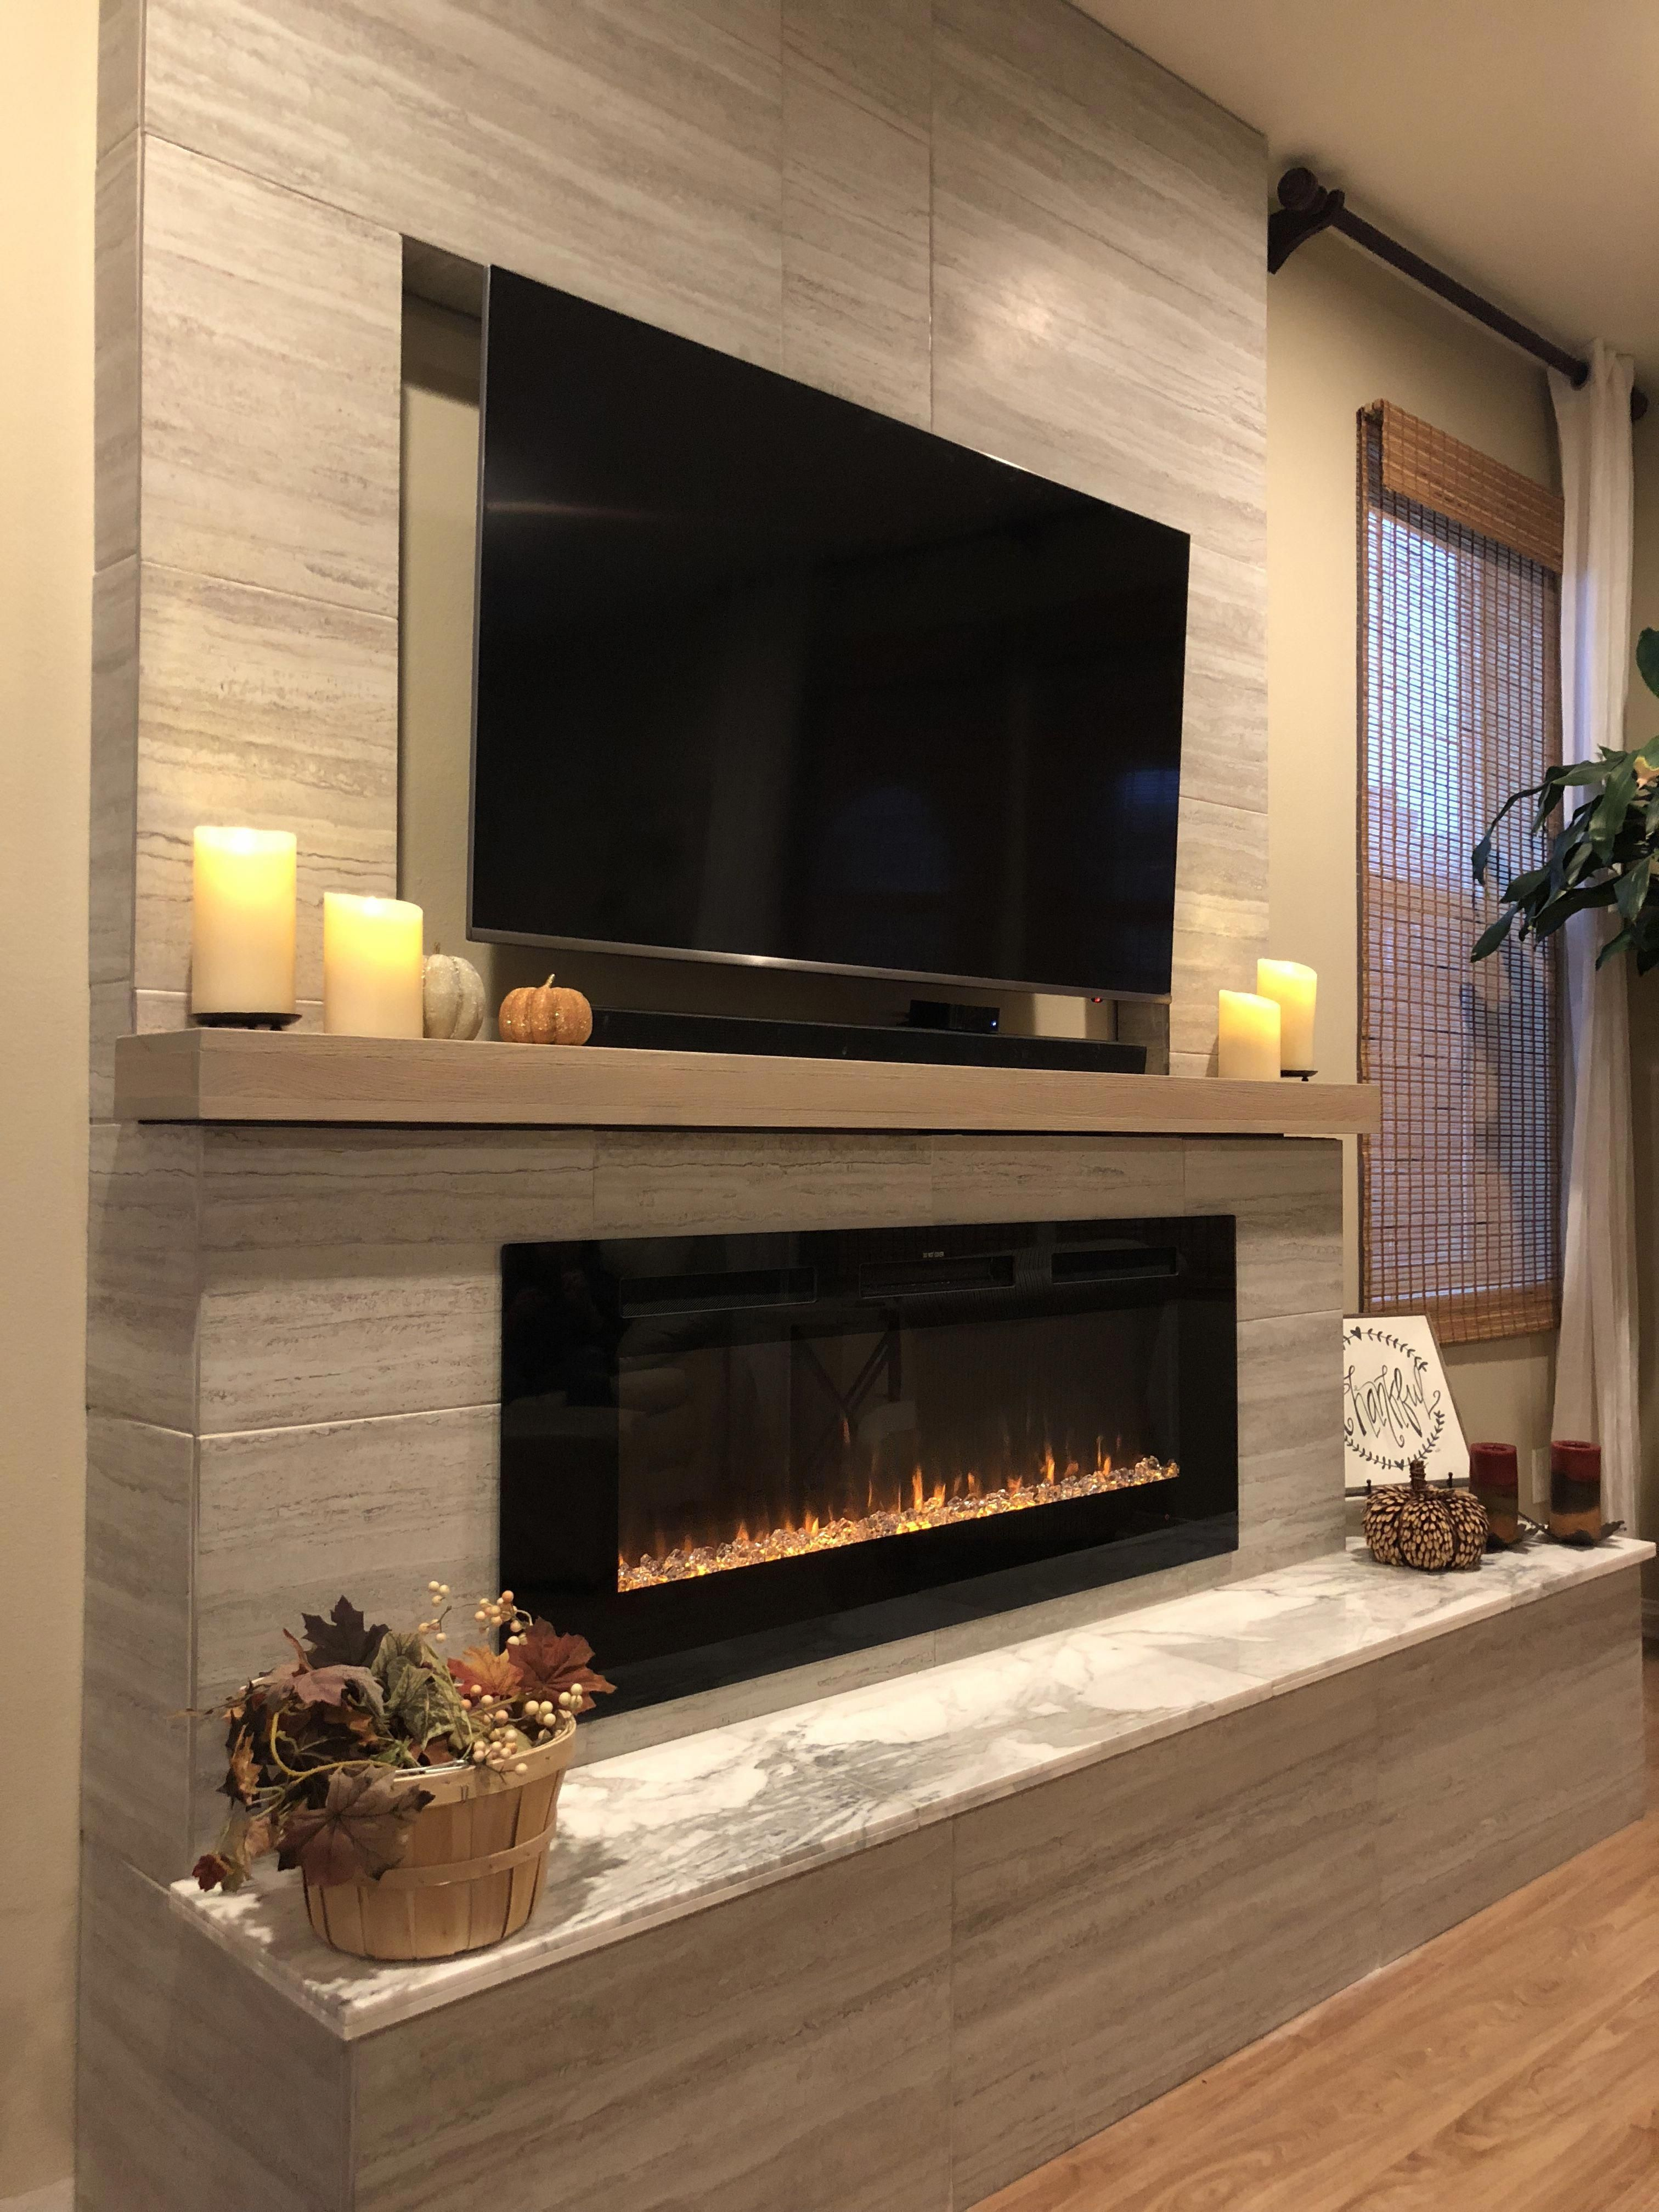 Modernhomedecorinteriordesign Electric Fireplace Living Room Modern Fireplace Decor Fireplace Design